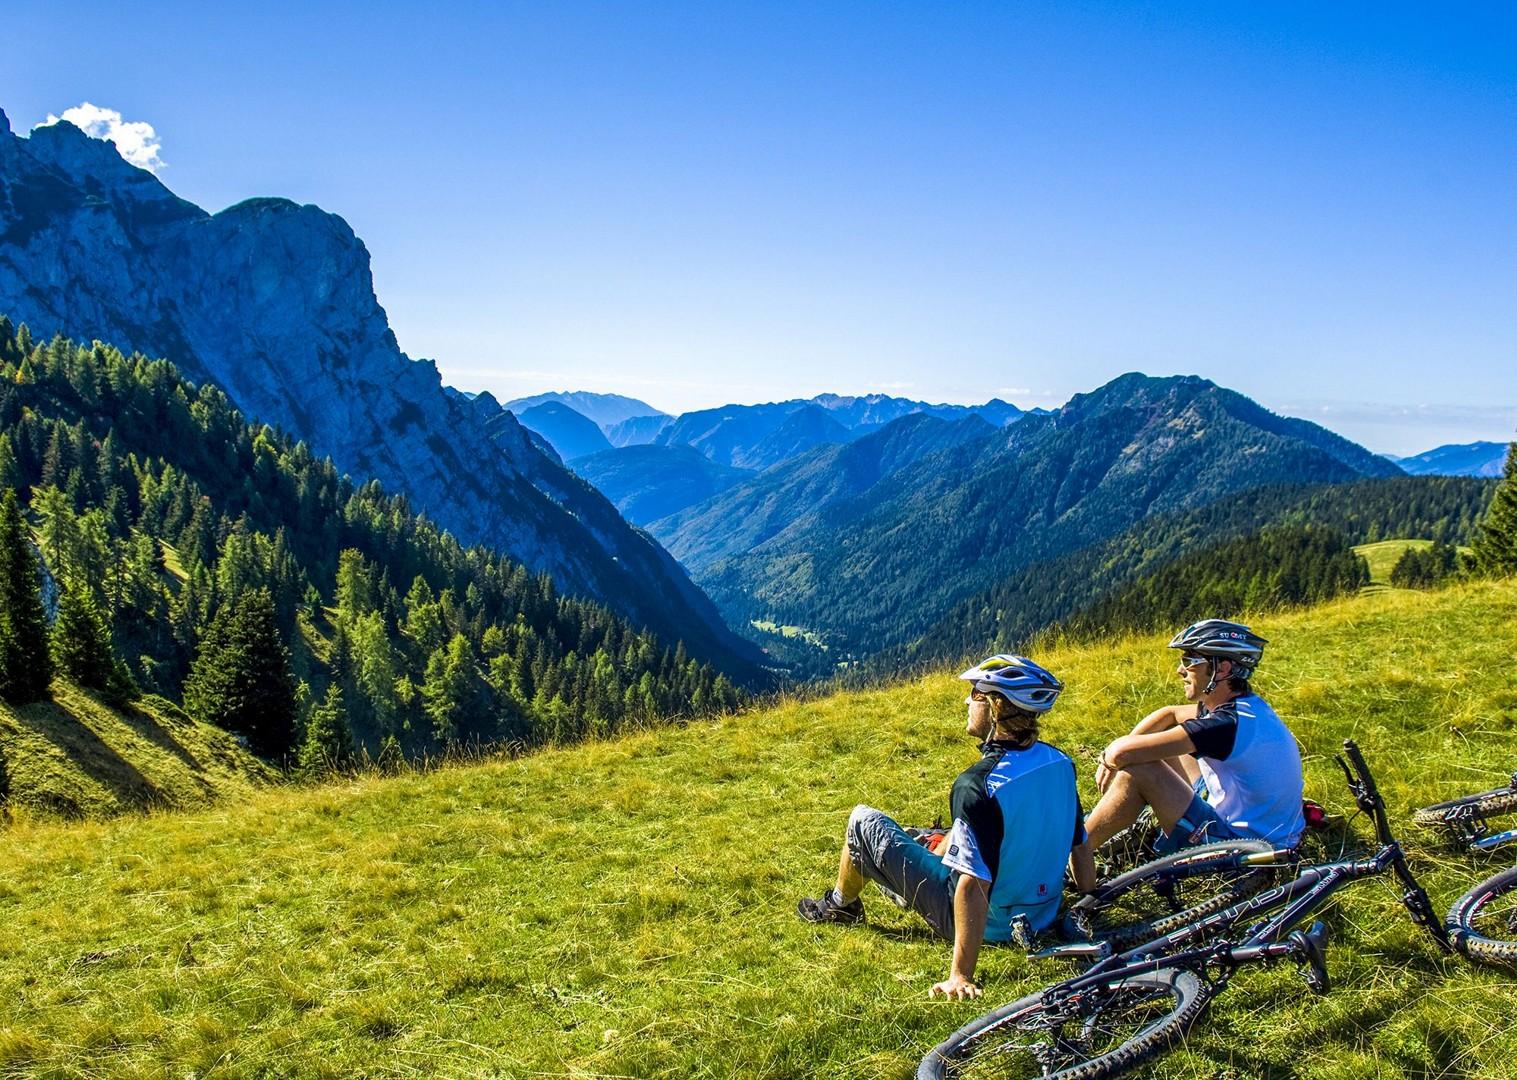 Brenta_Bike_2007_066-2.jpg - Italy - Dolomites of Brenta - Guided Mountain Bike Holiday - Mountain Biking